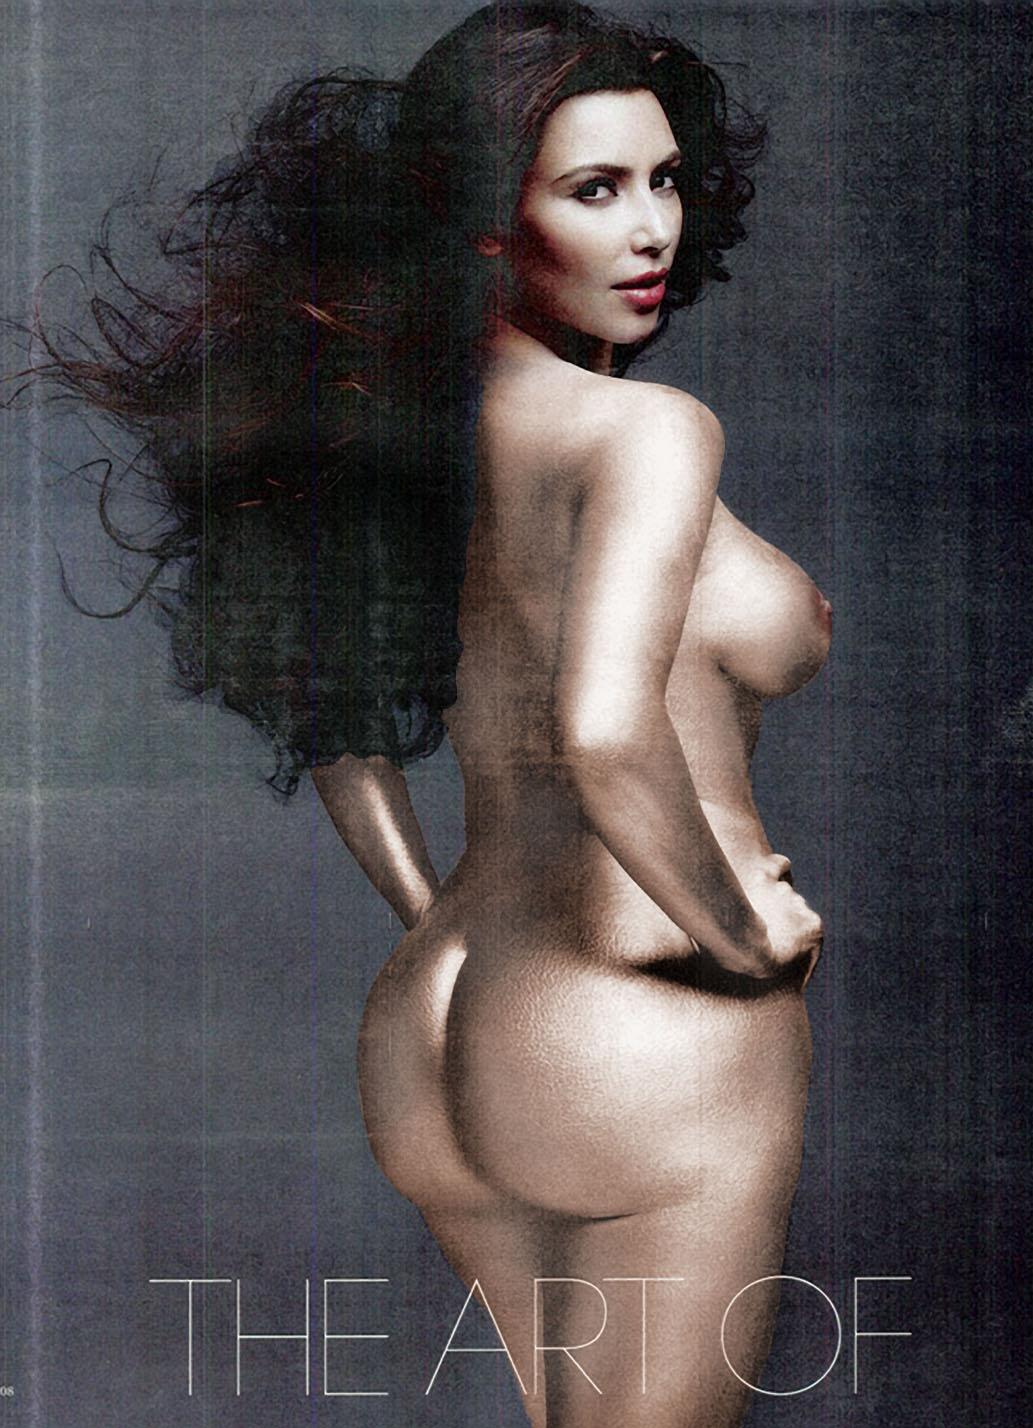 http://4.bp.blogspot.com/_L1s_dMOz3fI/TLgNvCRoHjI/AAAAAAAABQc/yRCke3cCmHs/s1600/Kim-Kardashian-Colorized-2.jpg